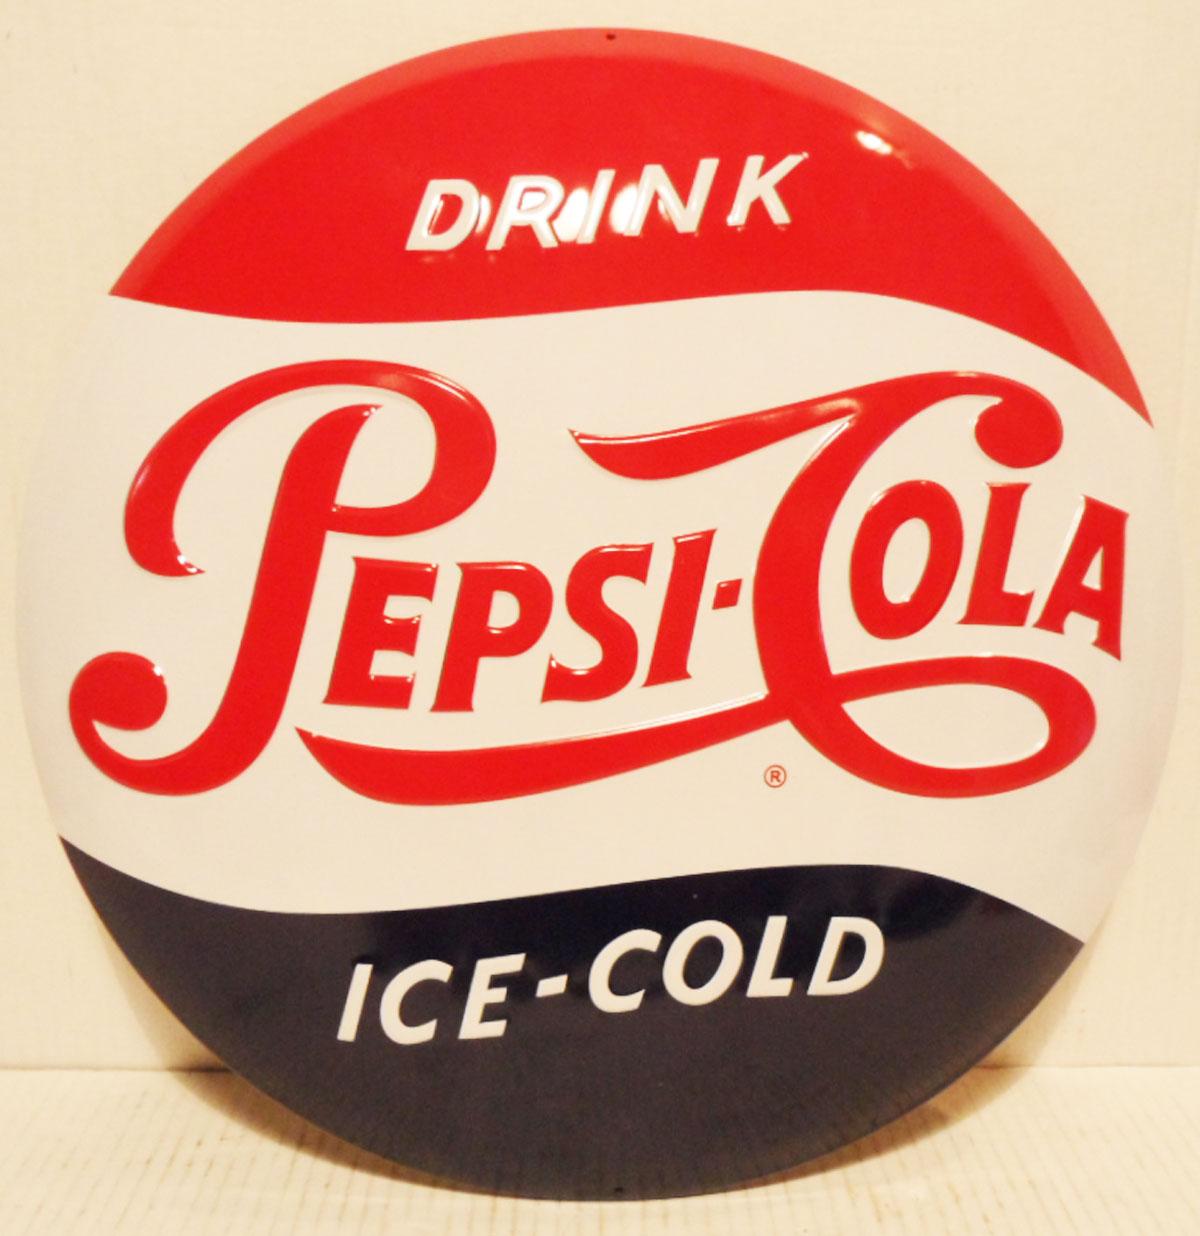 Drink Pepsi-Cola round Button Metalen Bord